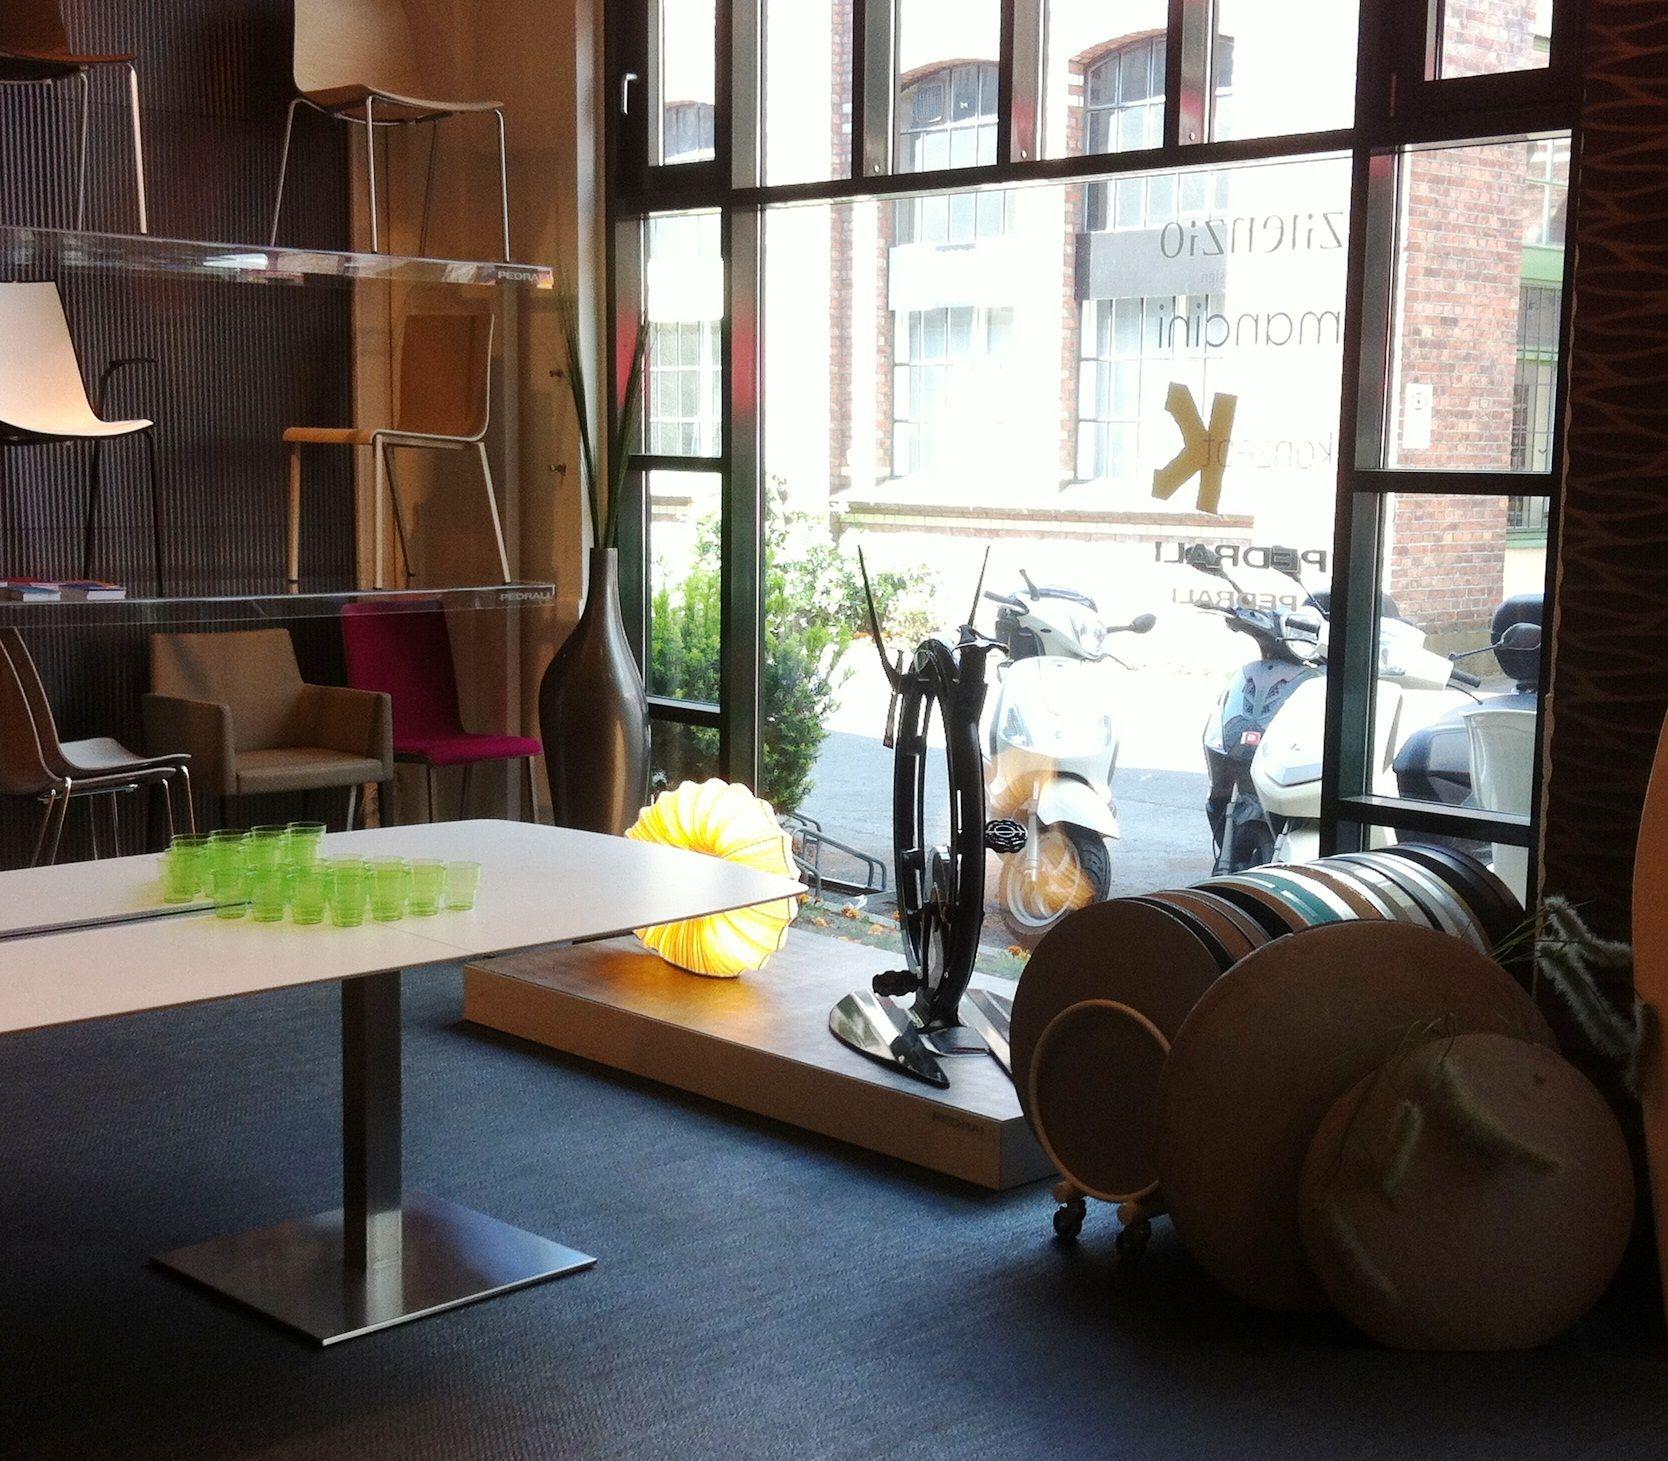 Delightful Ciclotte At Mancini Contract Furniture Showroom In Oslo